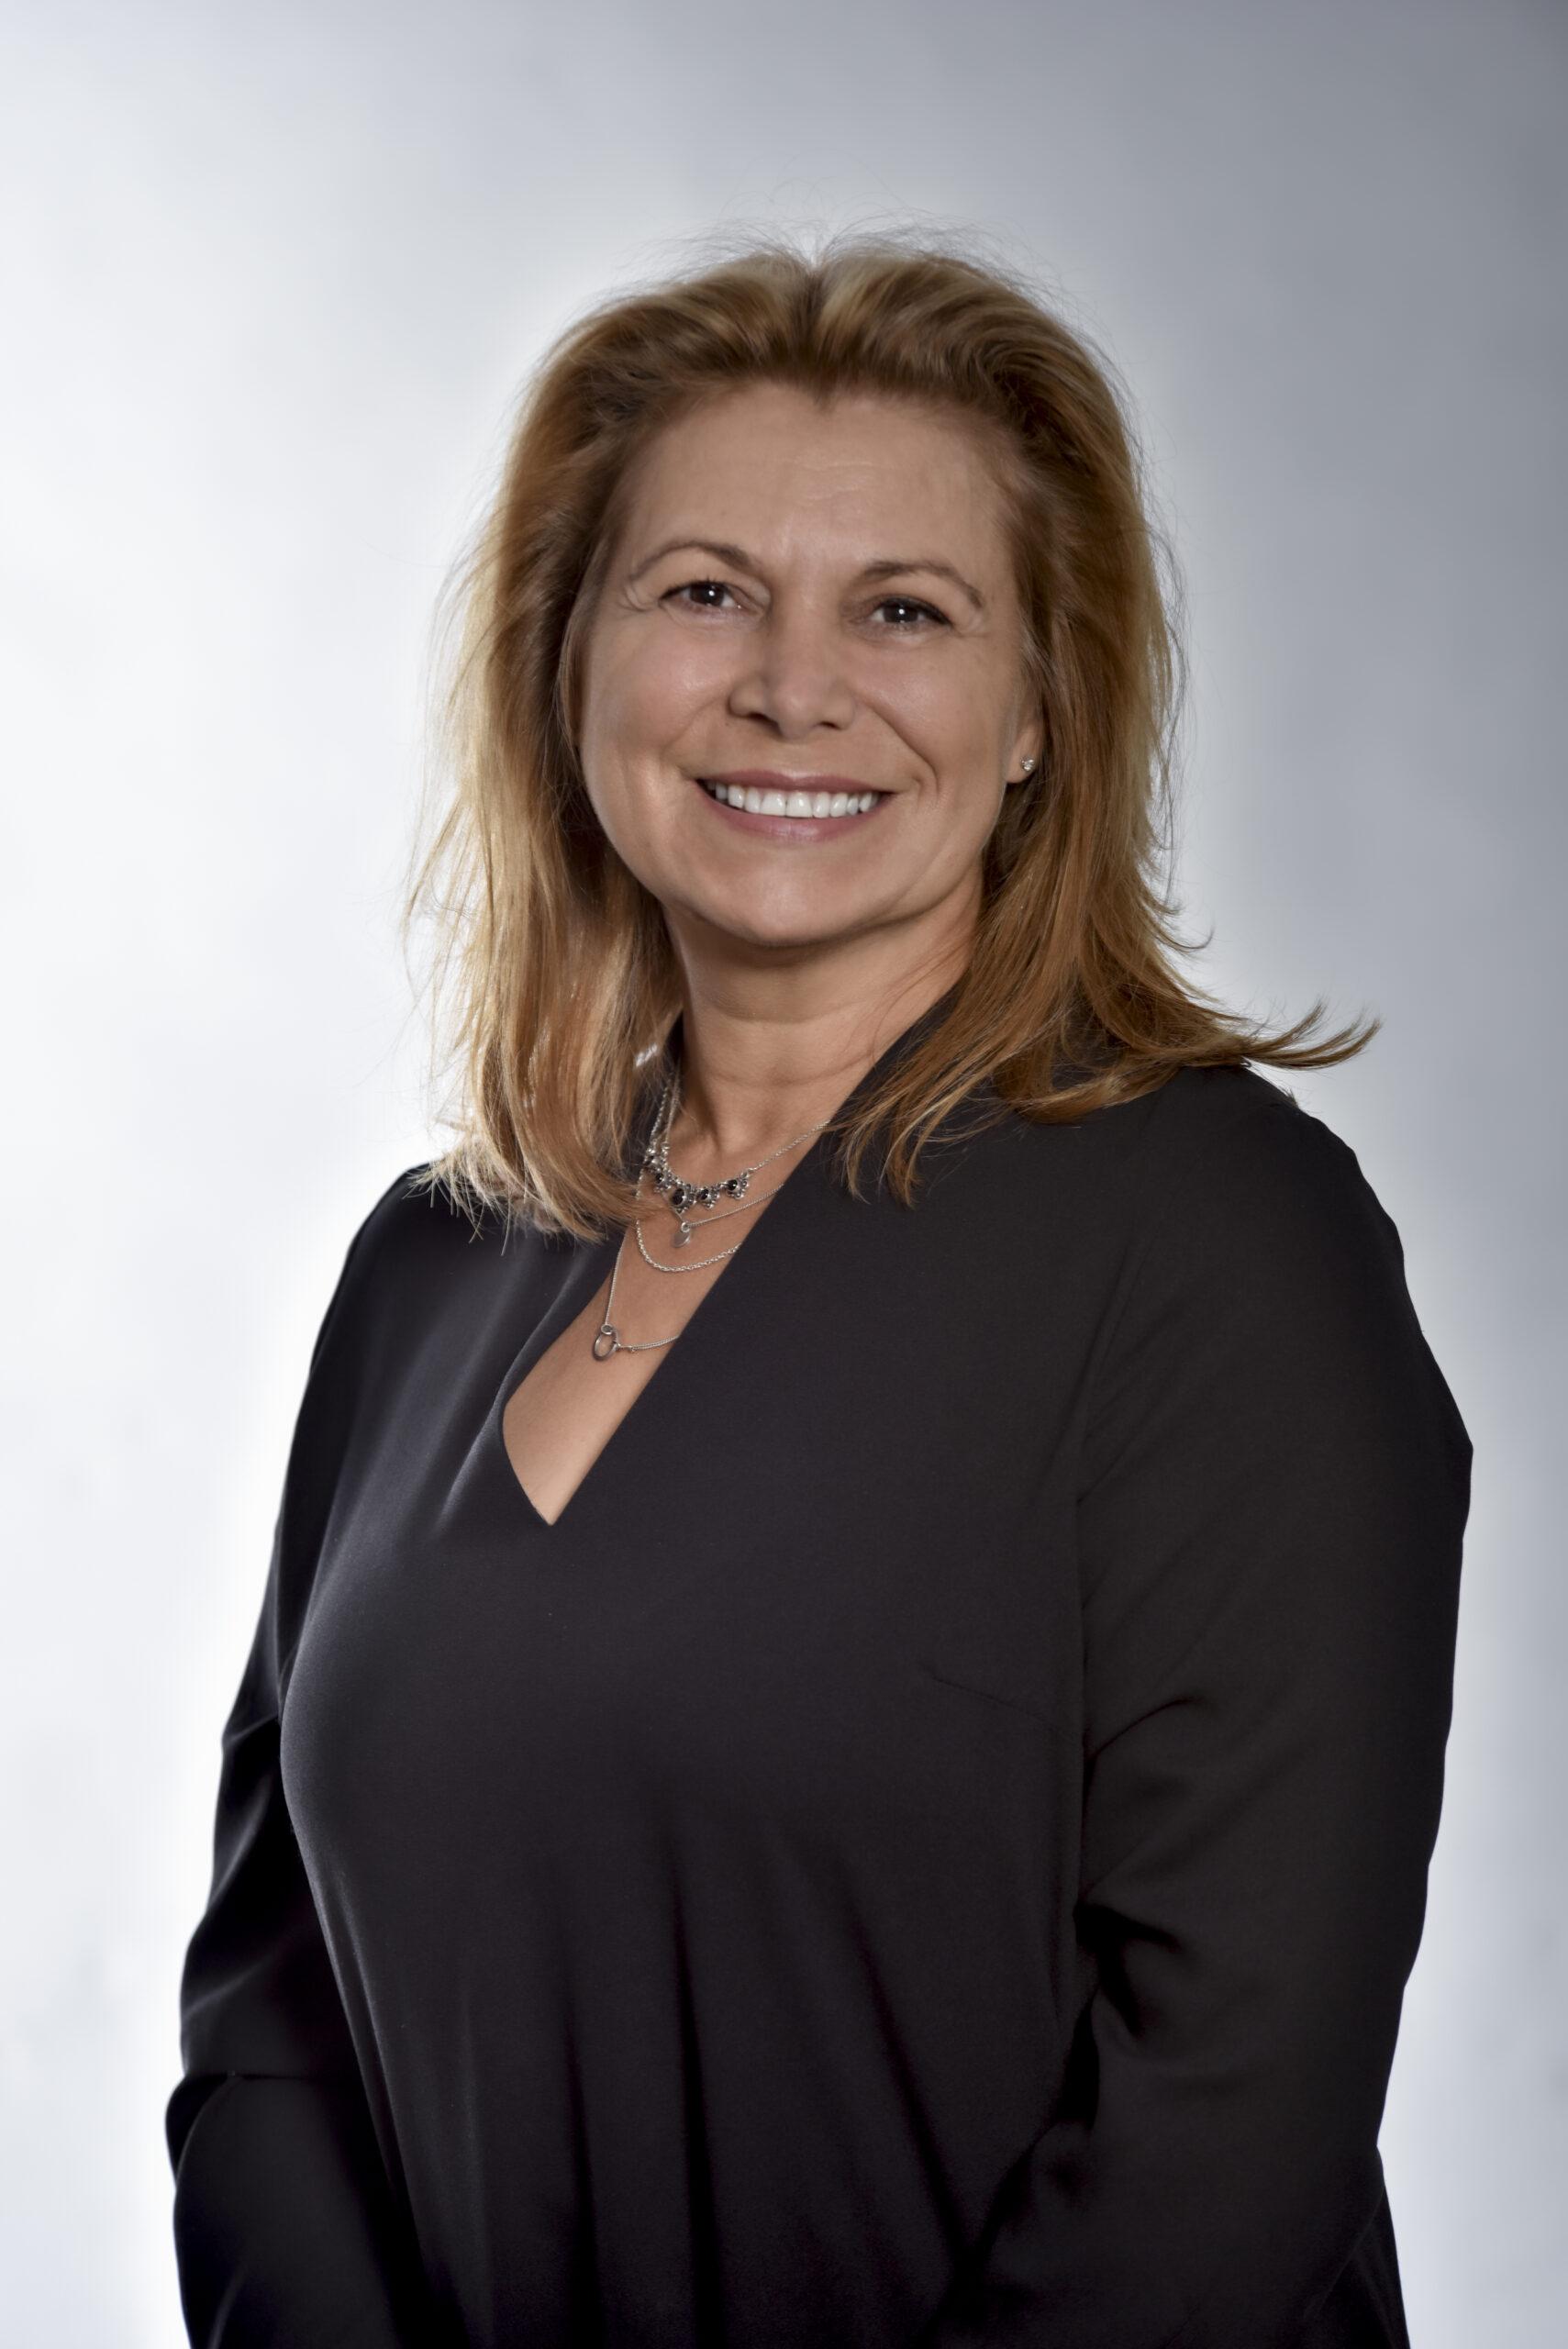 Sonia Tremblay